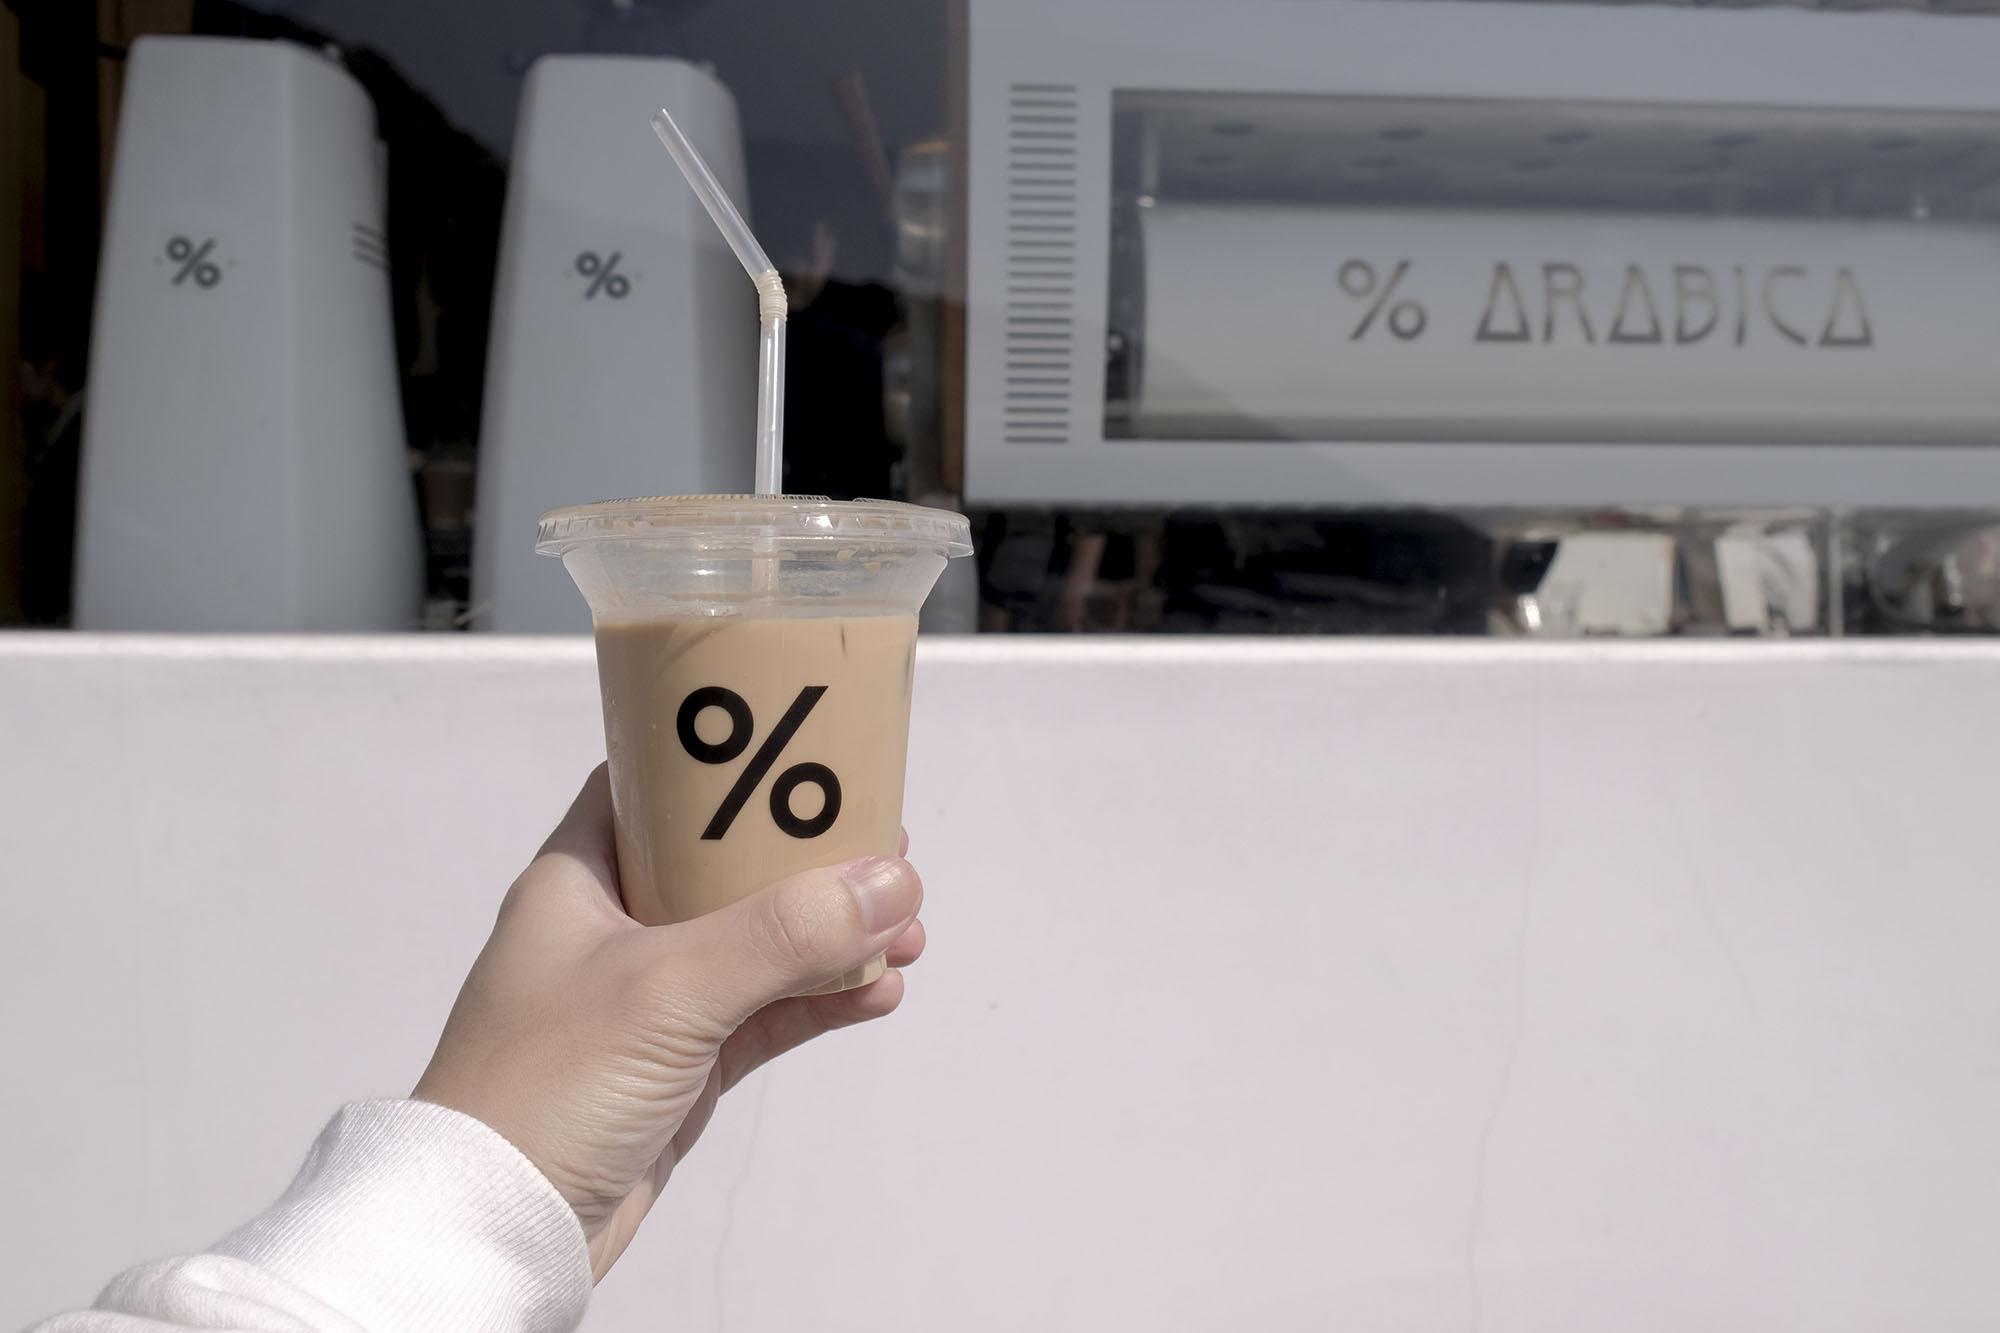 %Arabica嵐山店